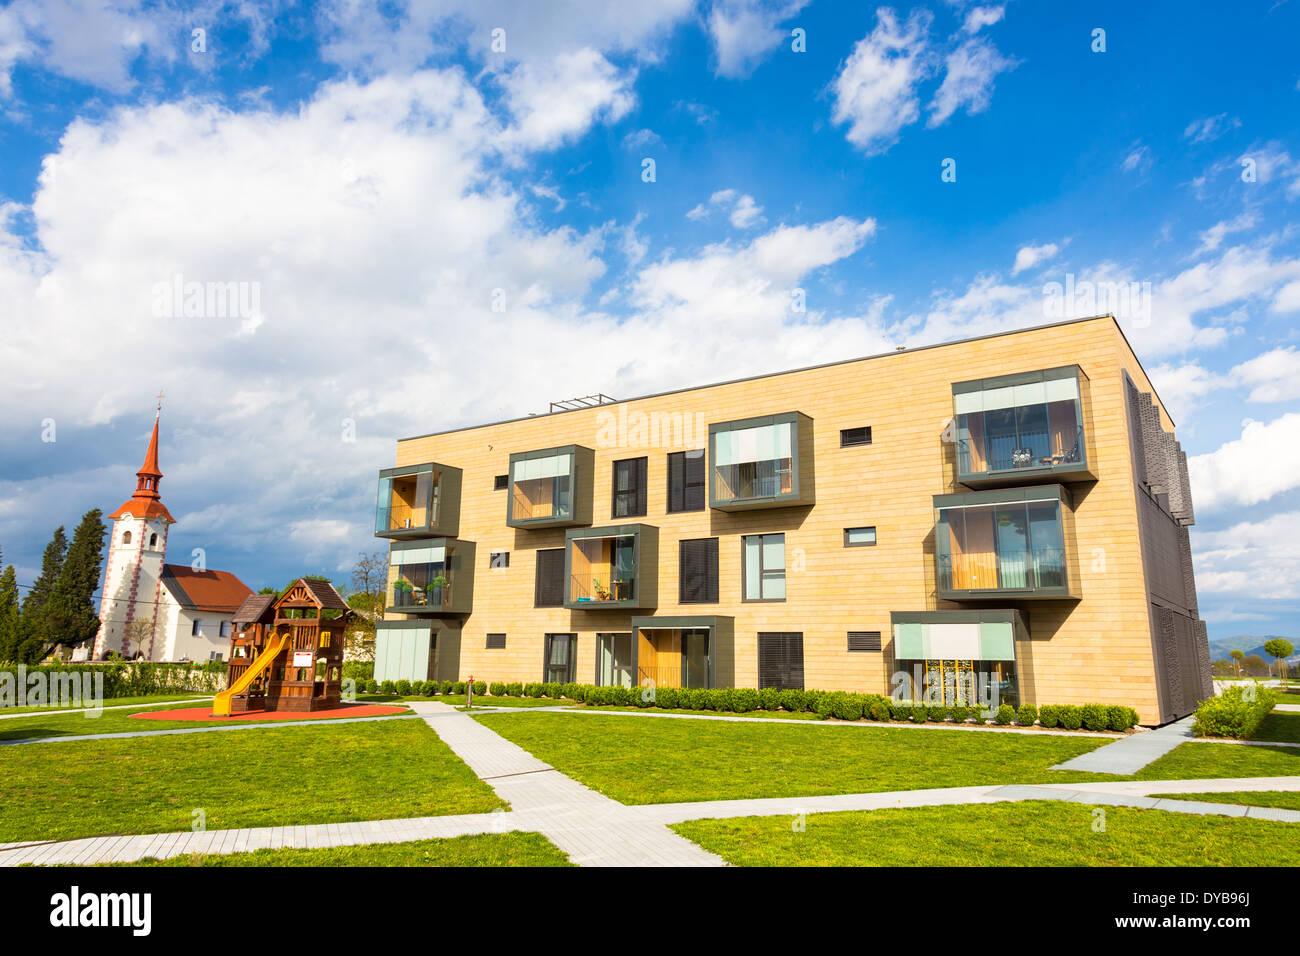 Moderne Wohnarchitektur Stockfoto, Bild: 68475530 - Alamy